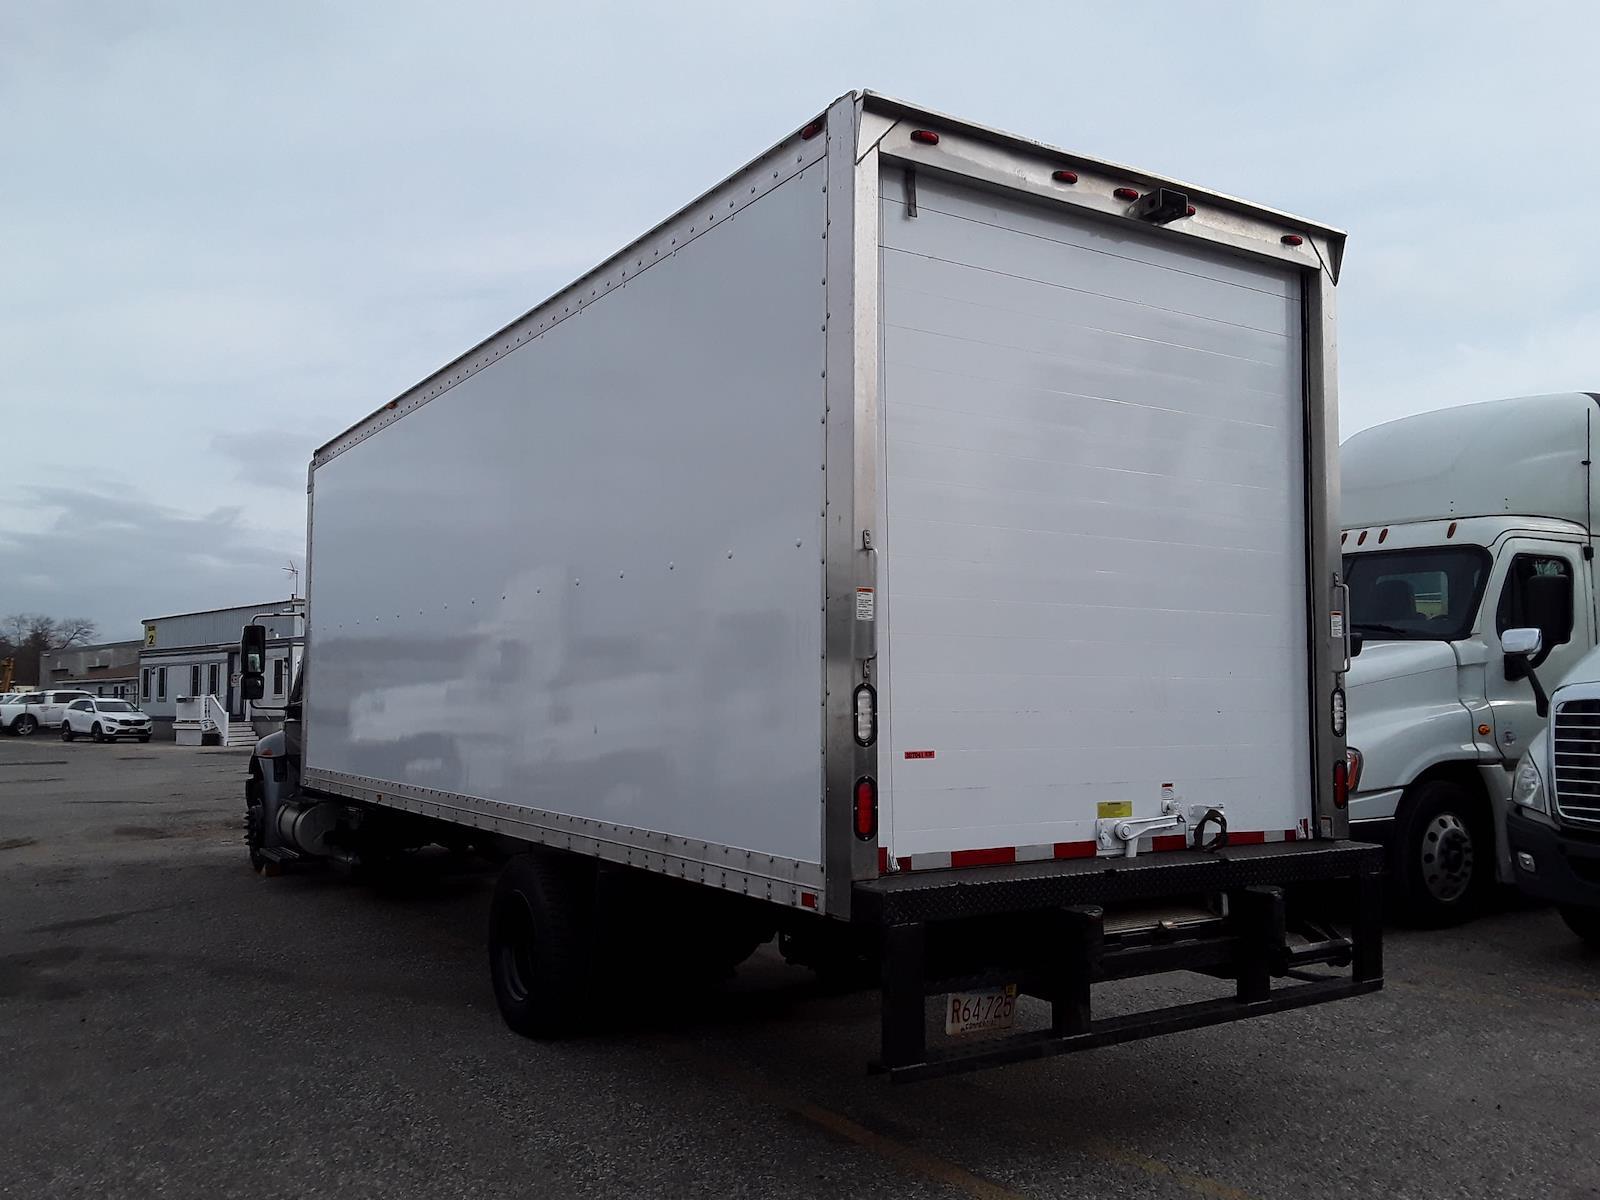 2015 International DuraStar 4300 4x2, Dry Freight #307041 - photo 1